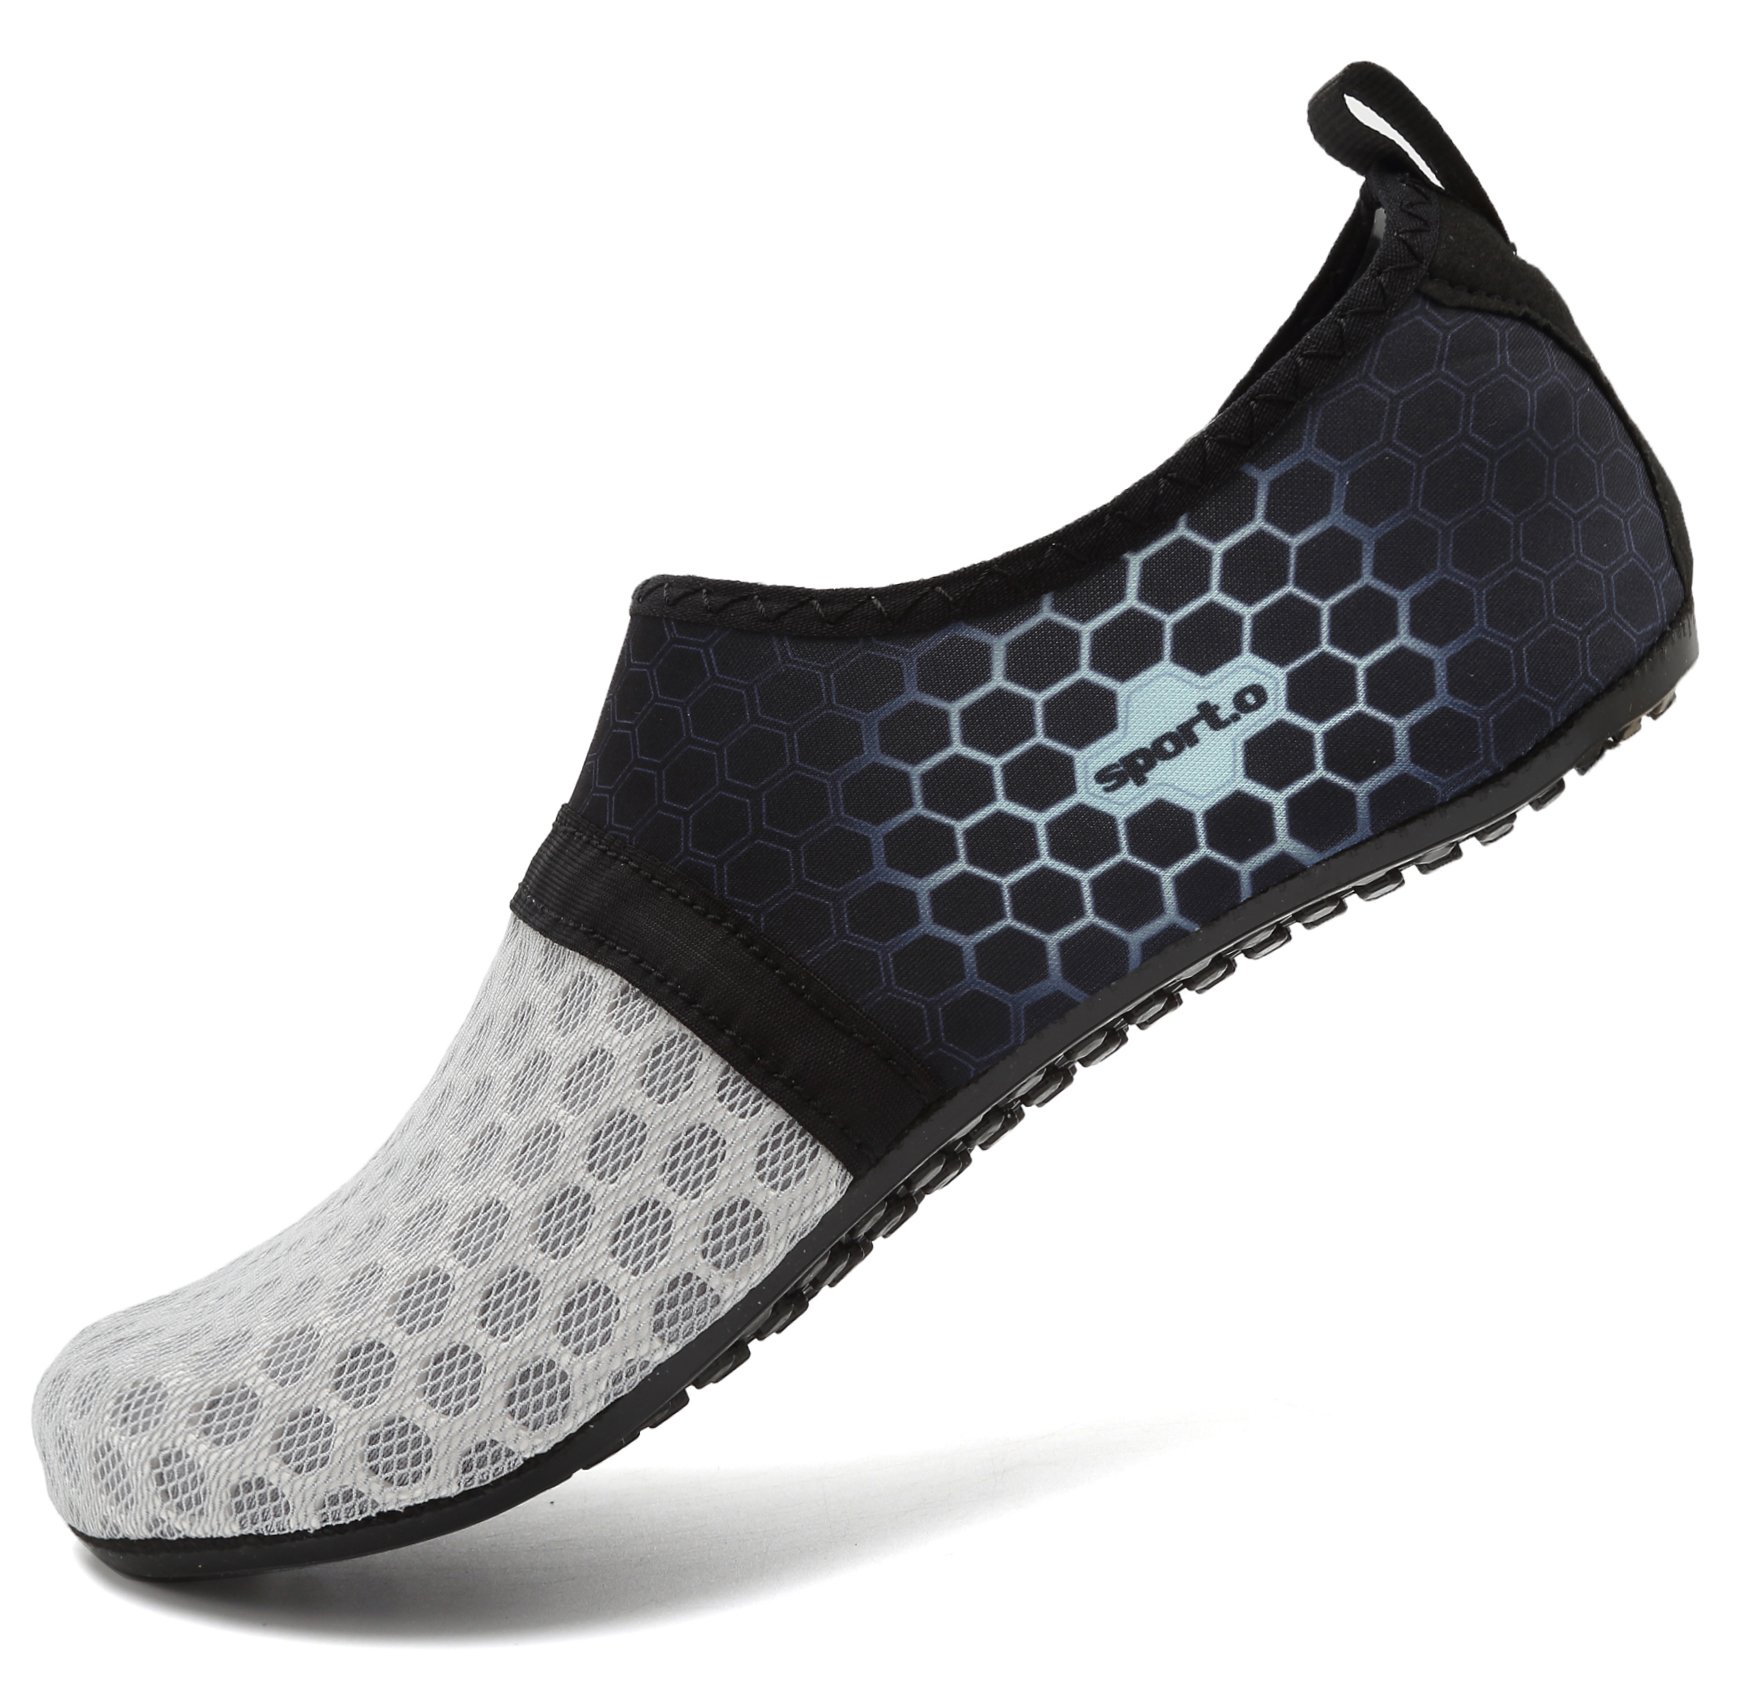 AoSiFu Women's Men's Water Sports Shoe Swim Footwears for Surf Yoga Aerobics L-Gray 38-39